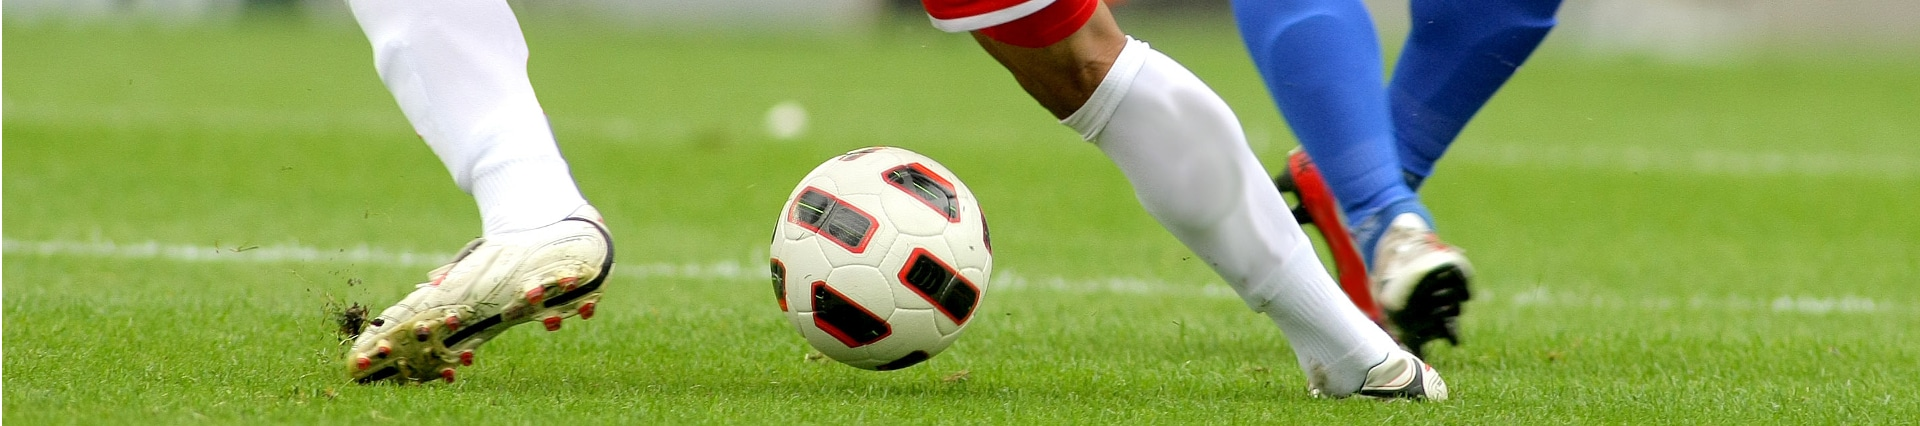 Football Coaching Liability Insurance